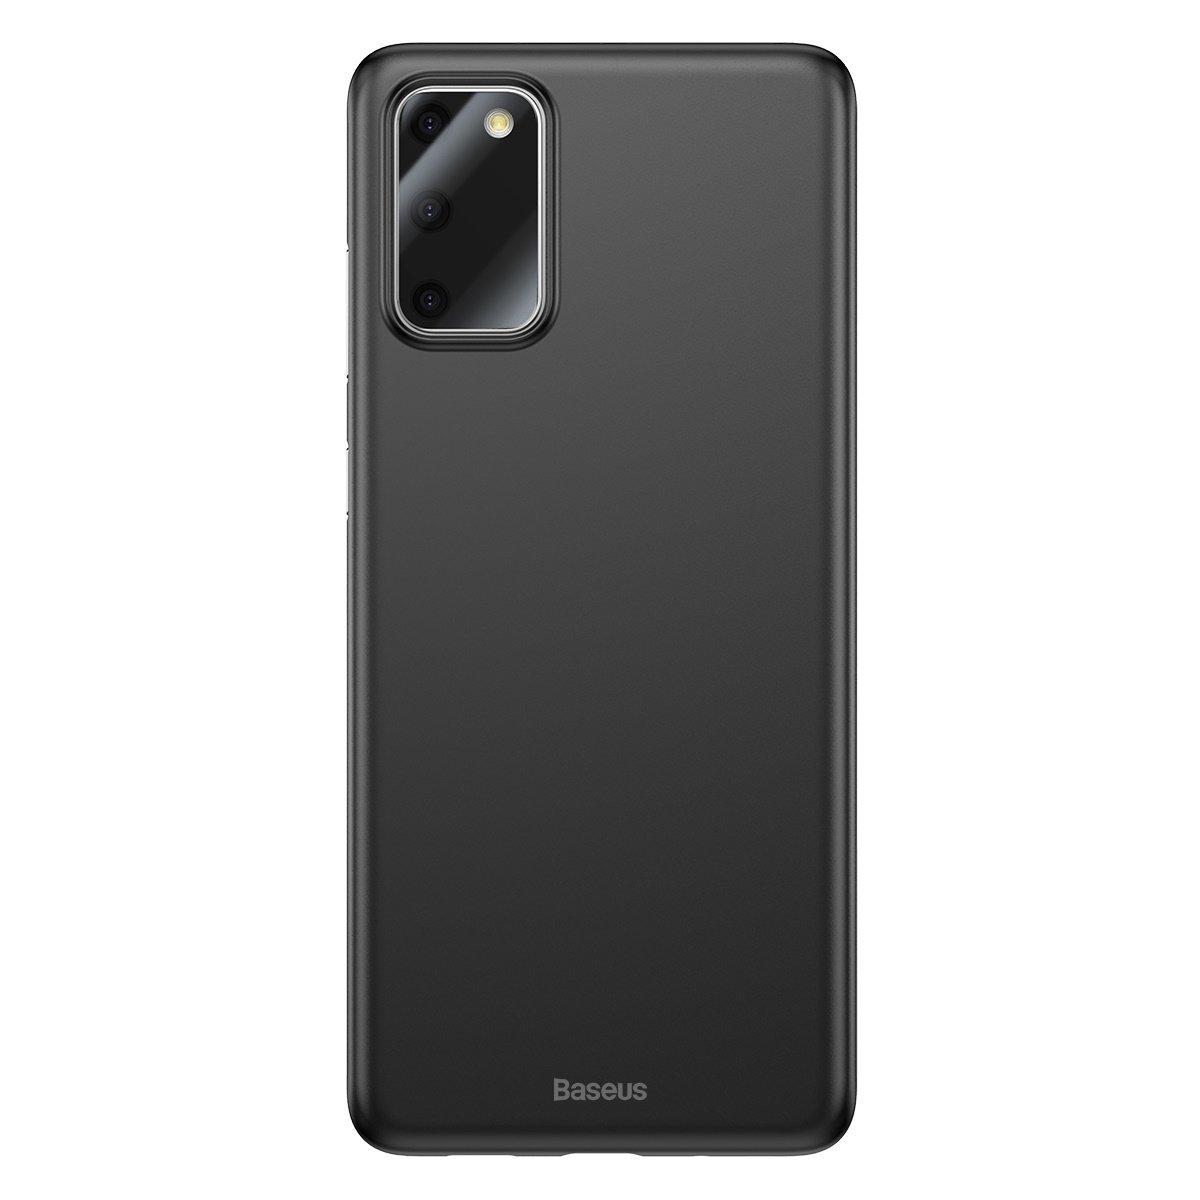 Husa Samsung Galaxy S20, Baseus Wing Case, Negru, Grosime 0.4 mm imagine